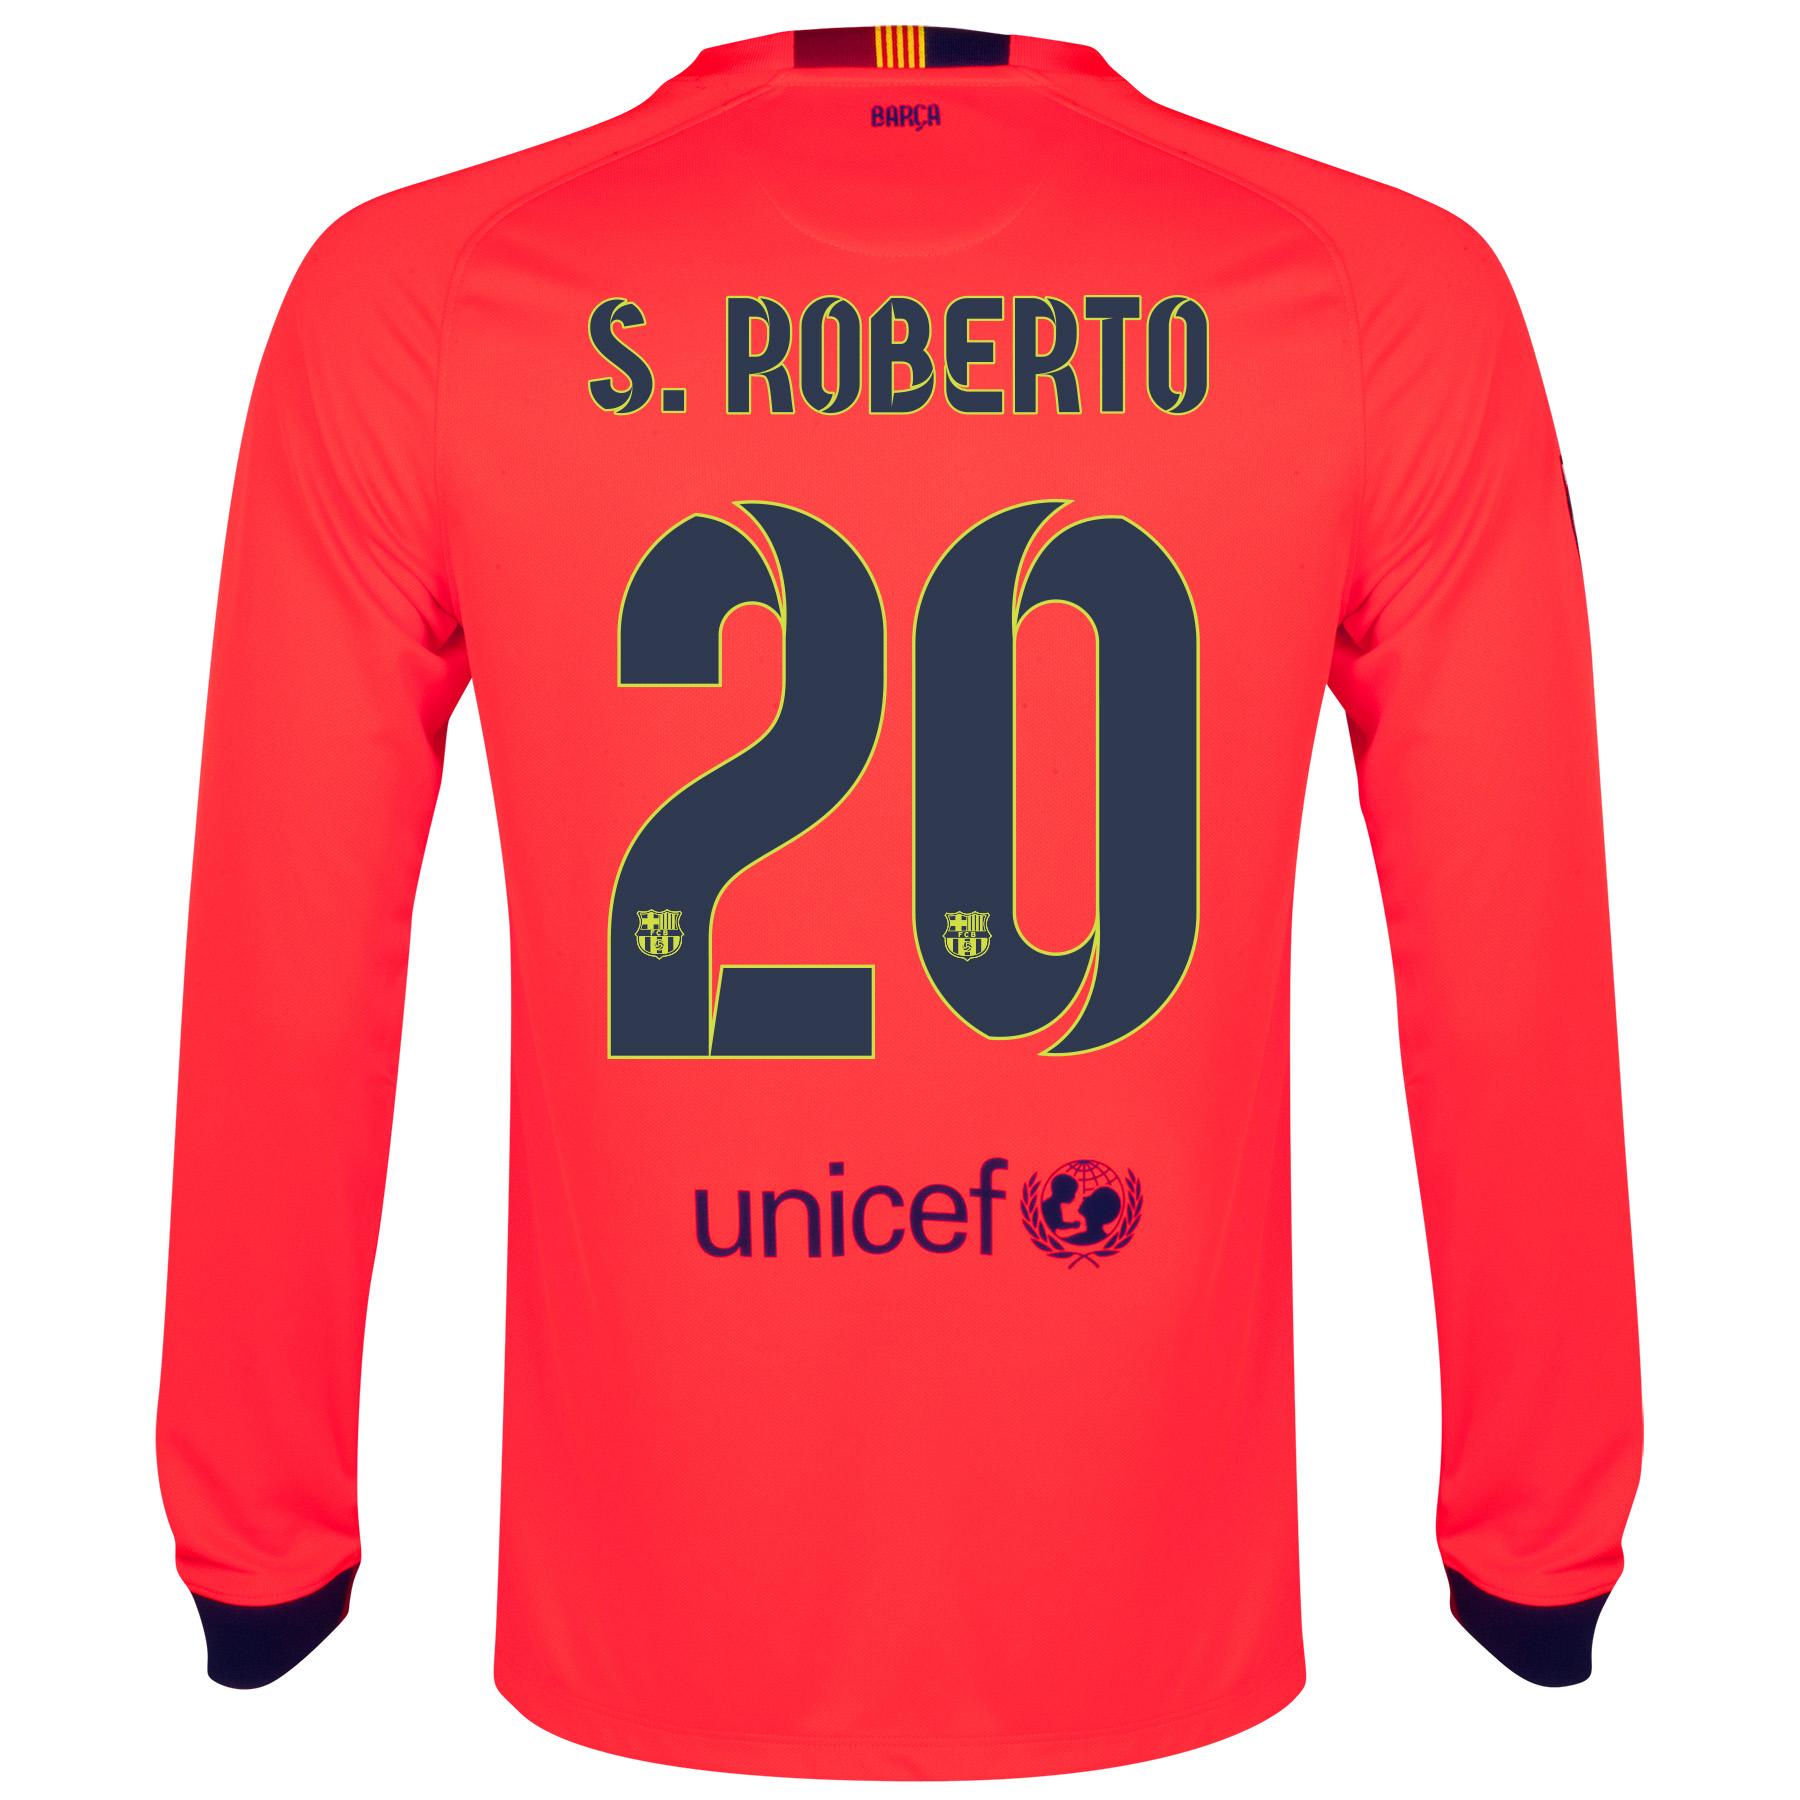 Barcelona Away Shirt 2014/15 - Long Sleeve Red with S.Roberto 20 printing